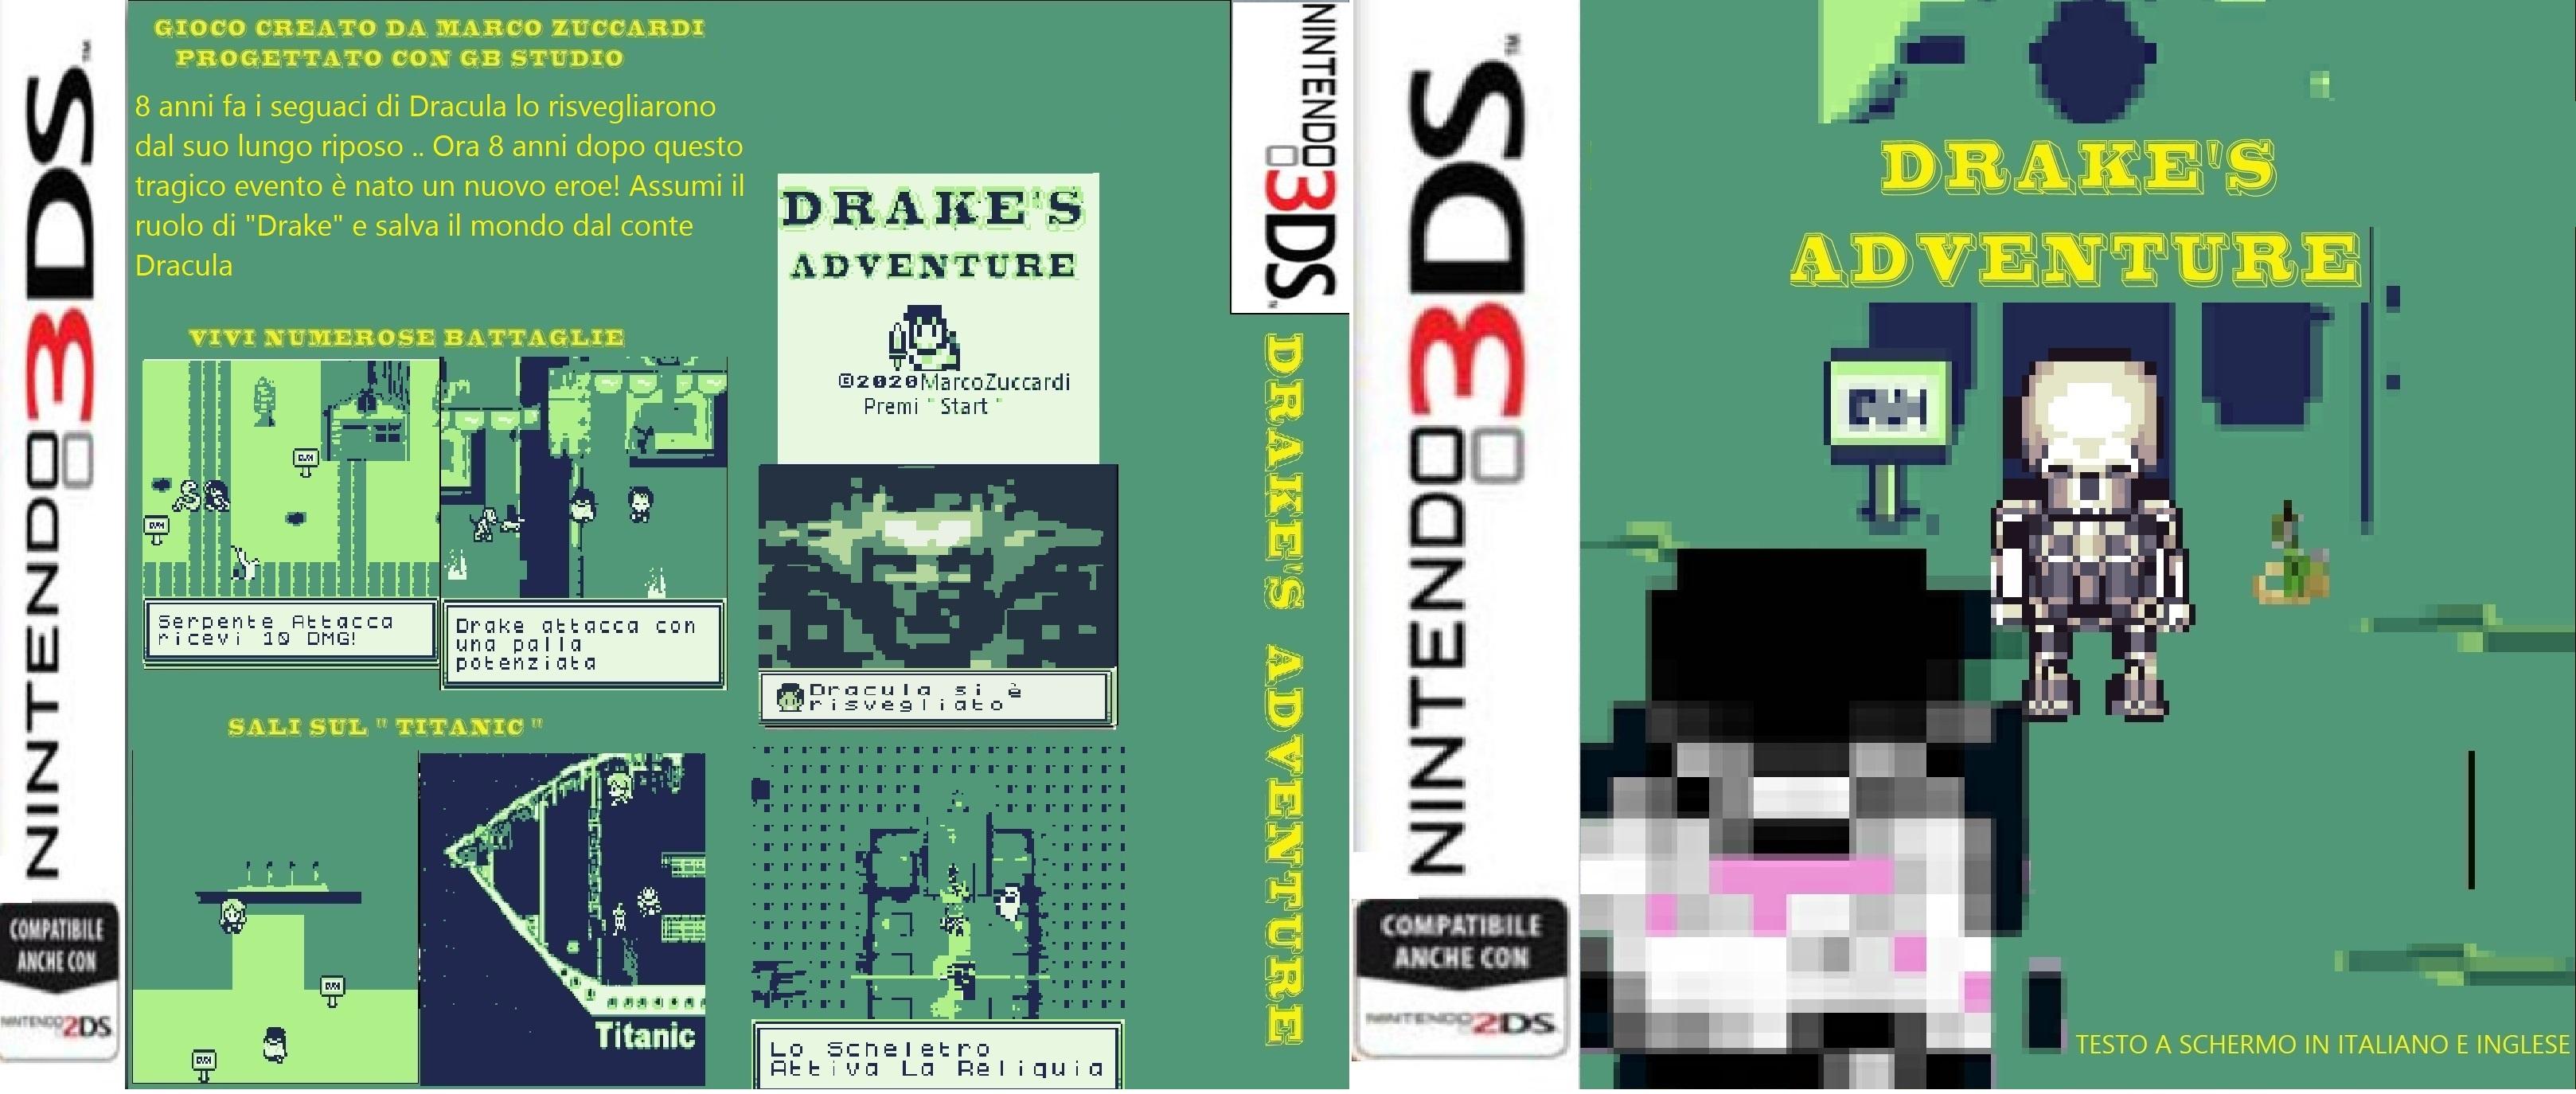 Nintendo 3ds Drakes Adventure